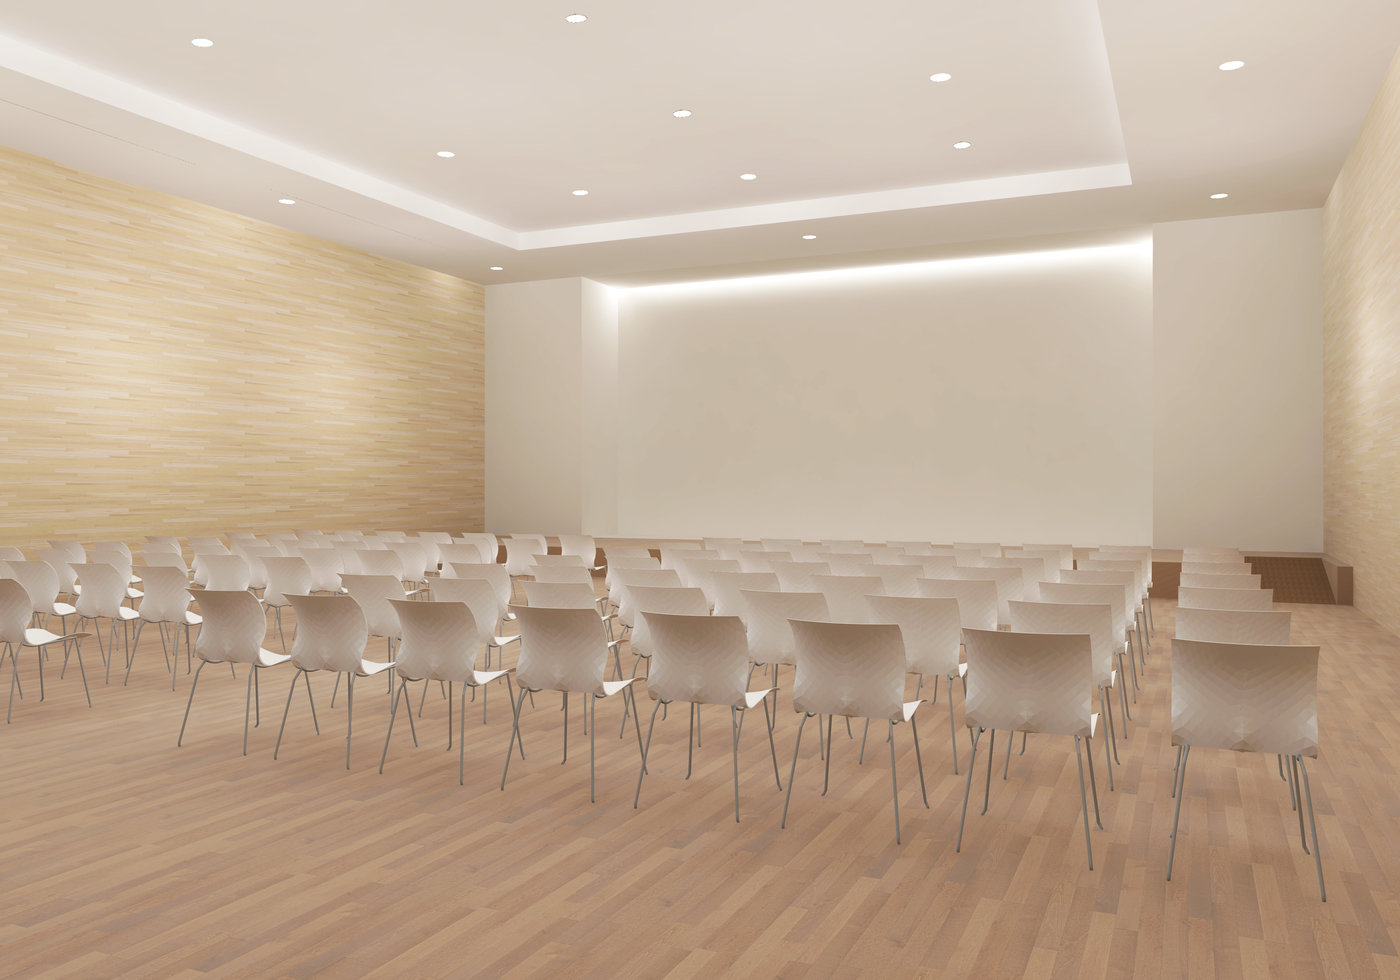 Thesis Project Cultural Venue By Goeun Kim At Coroflot Com